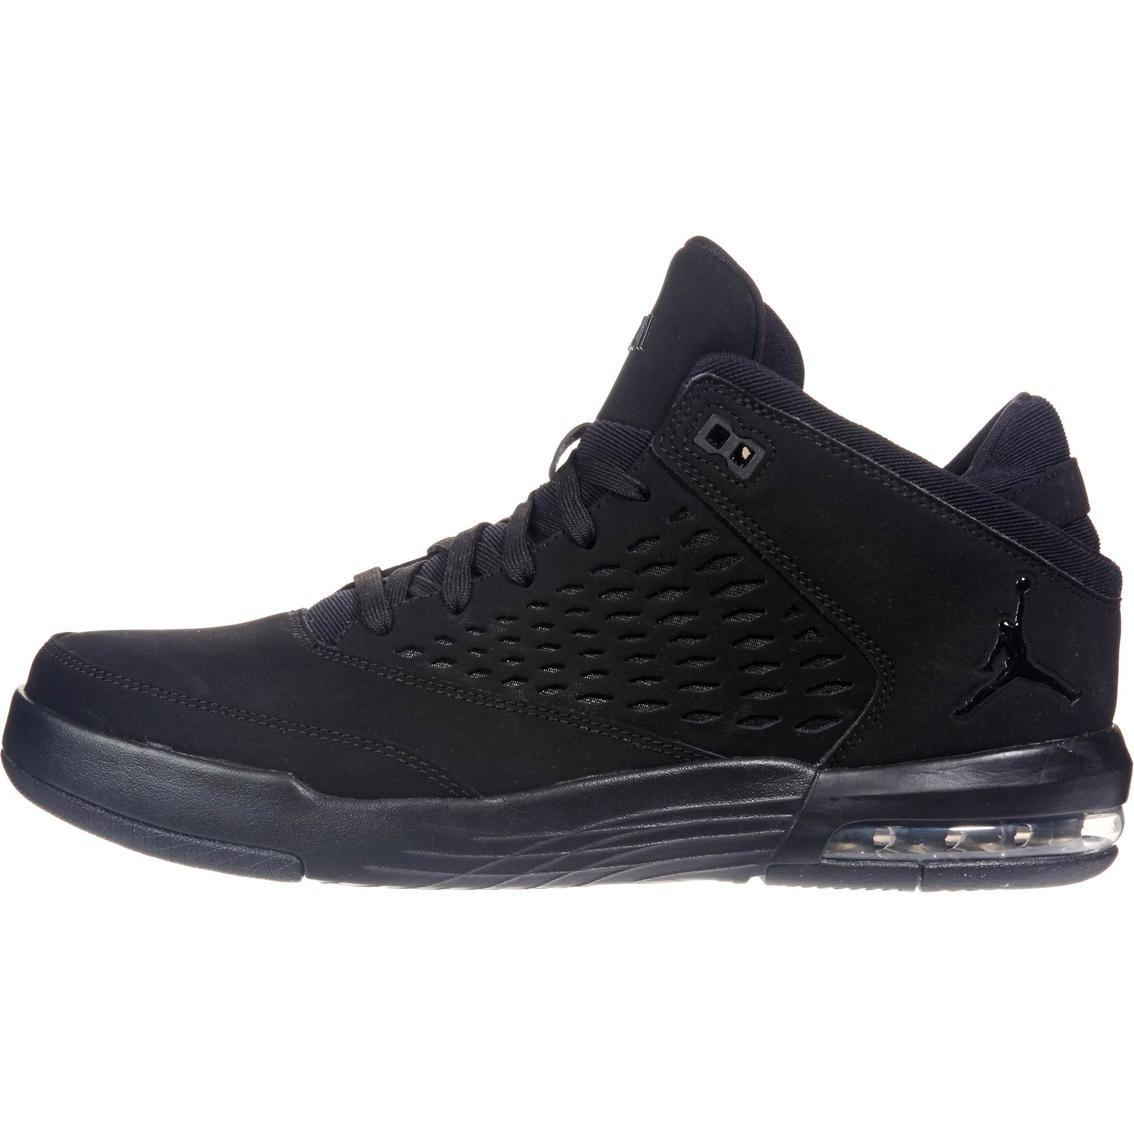 Jordan Men's Flight Origin 4 Shoes